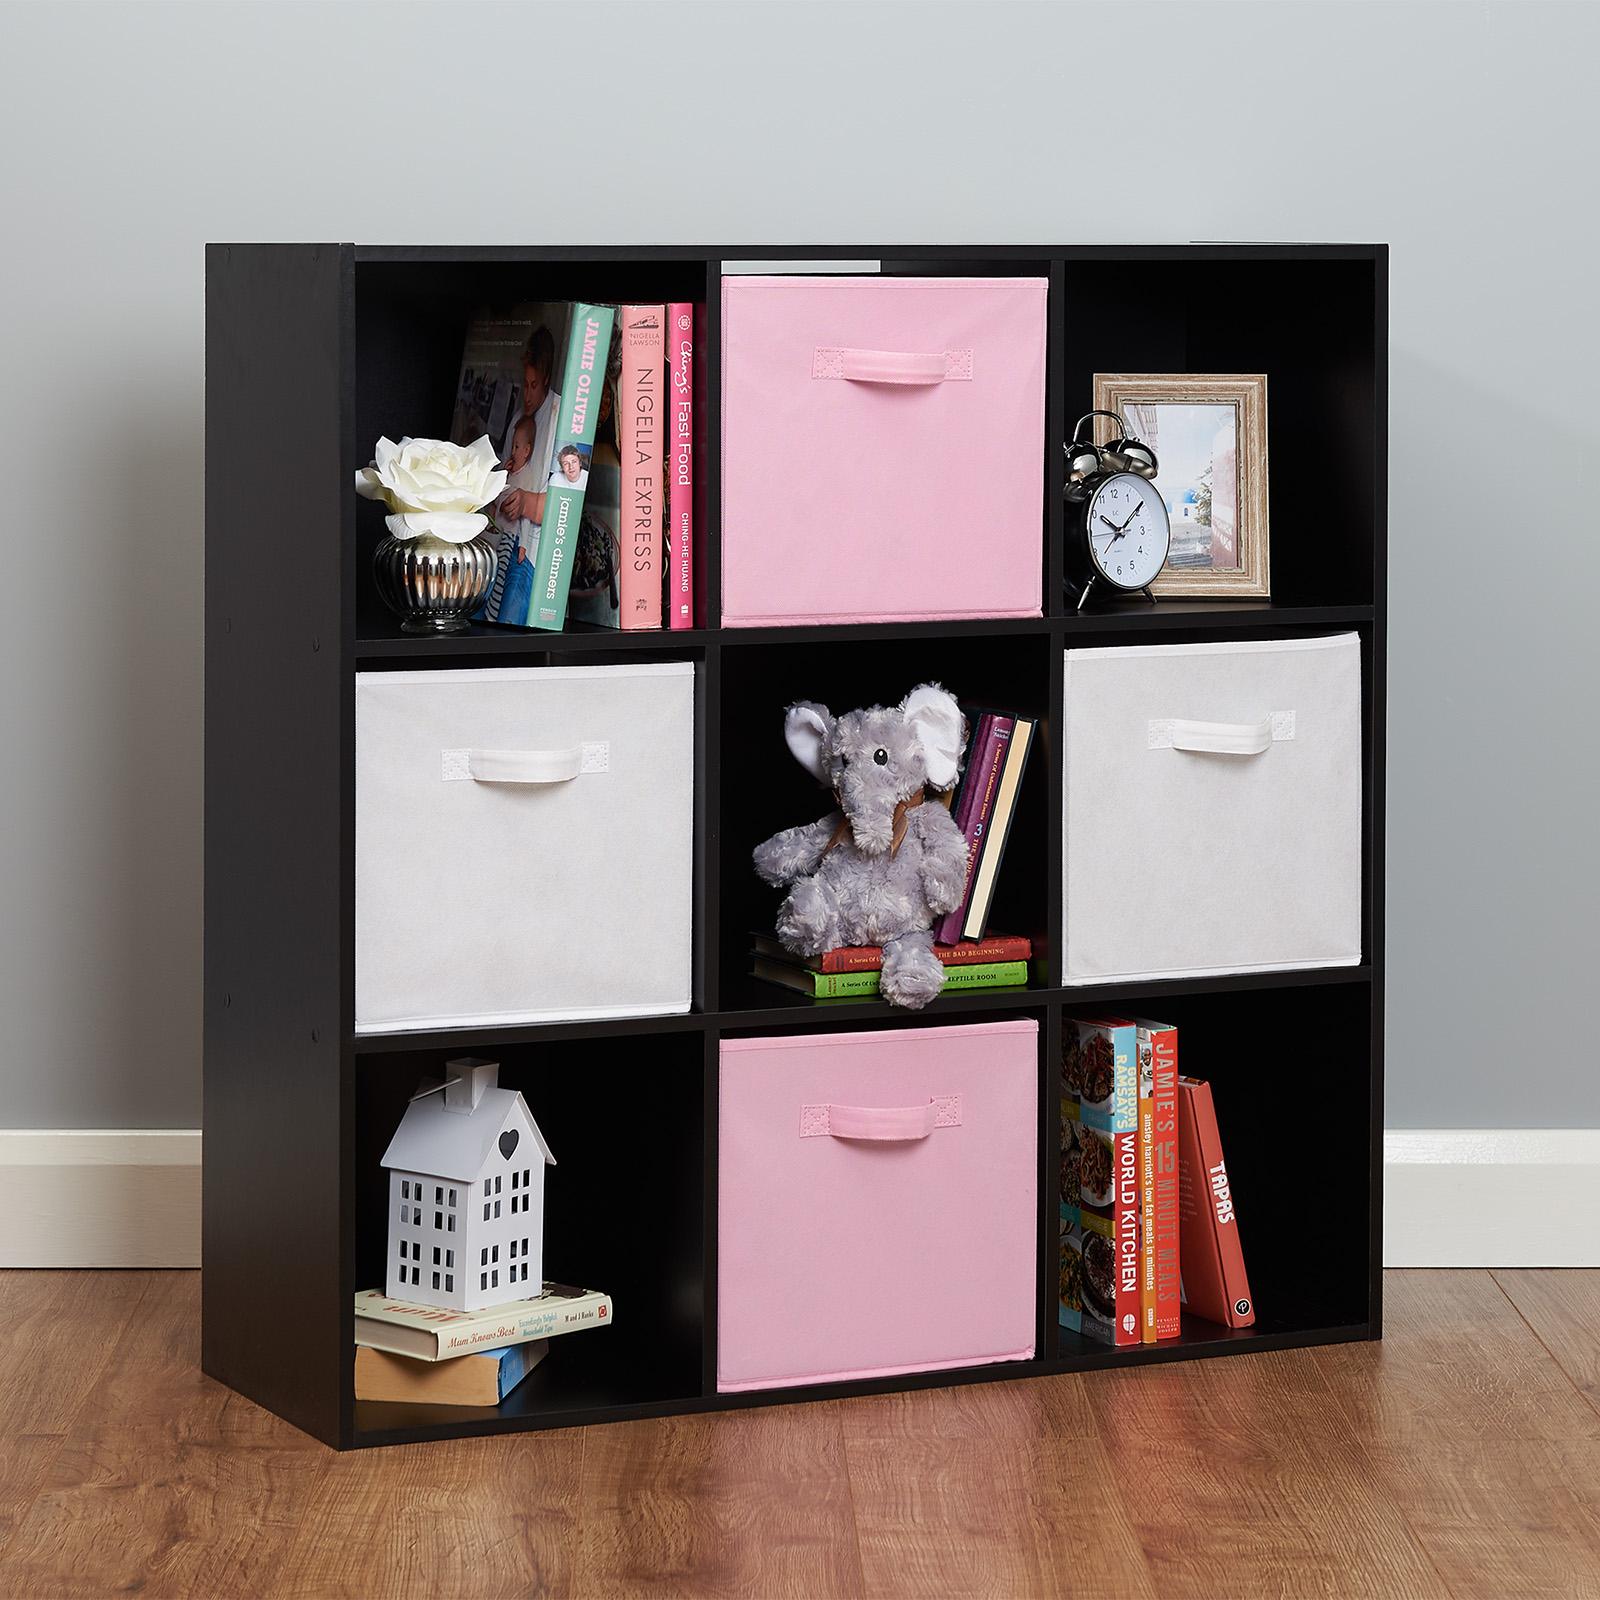 White 6 Cube Kids Toy Games Storage Unit Girls Boys: Black 9 Cube Kids Pink & White Toy/Games Storage Unit